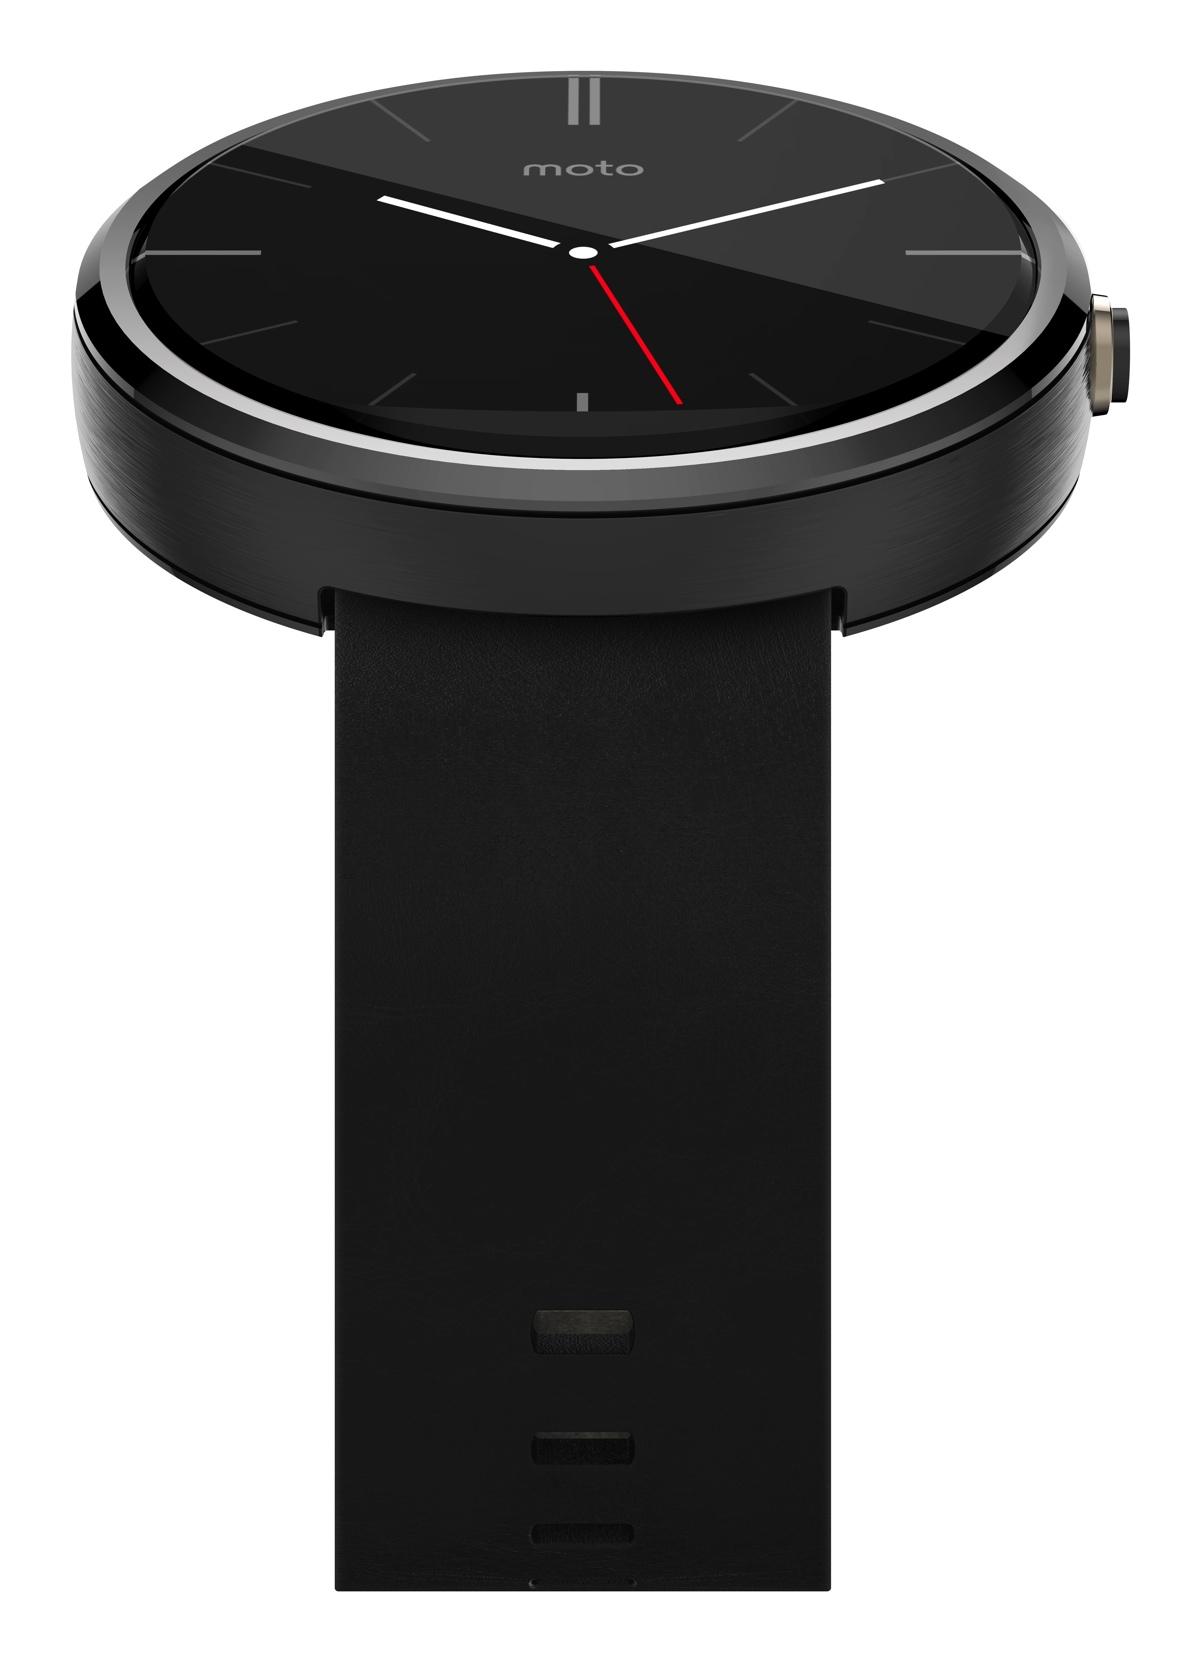 moto-360-smartwatch-5